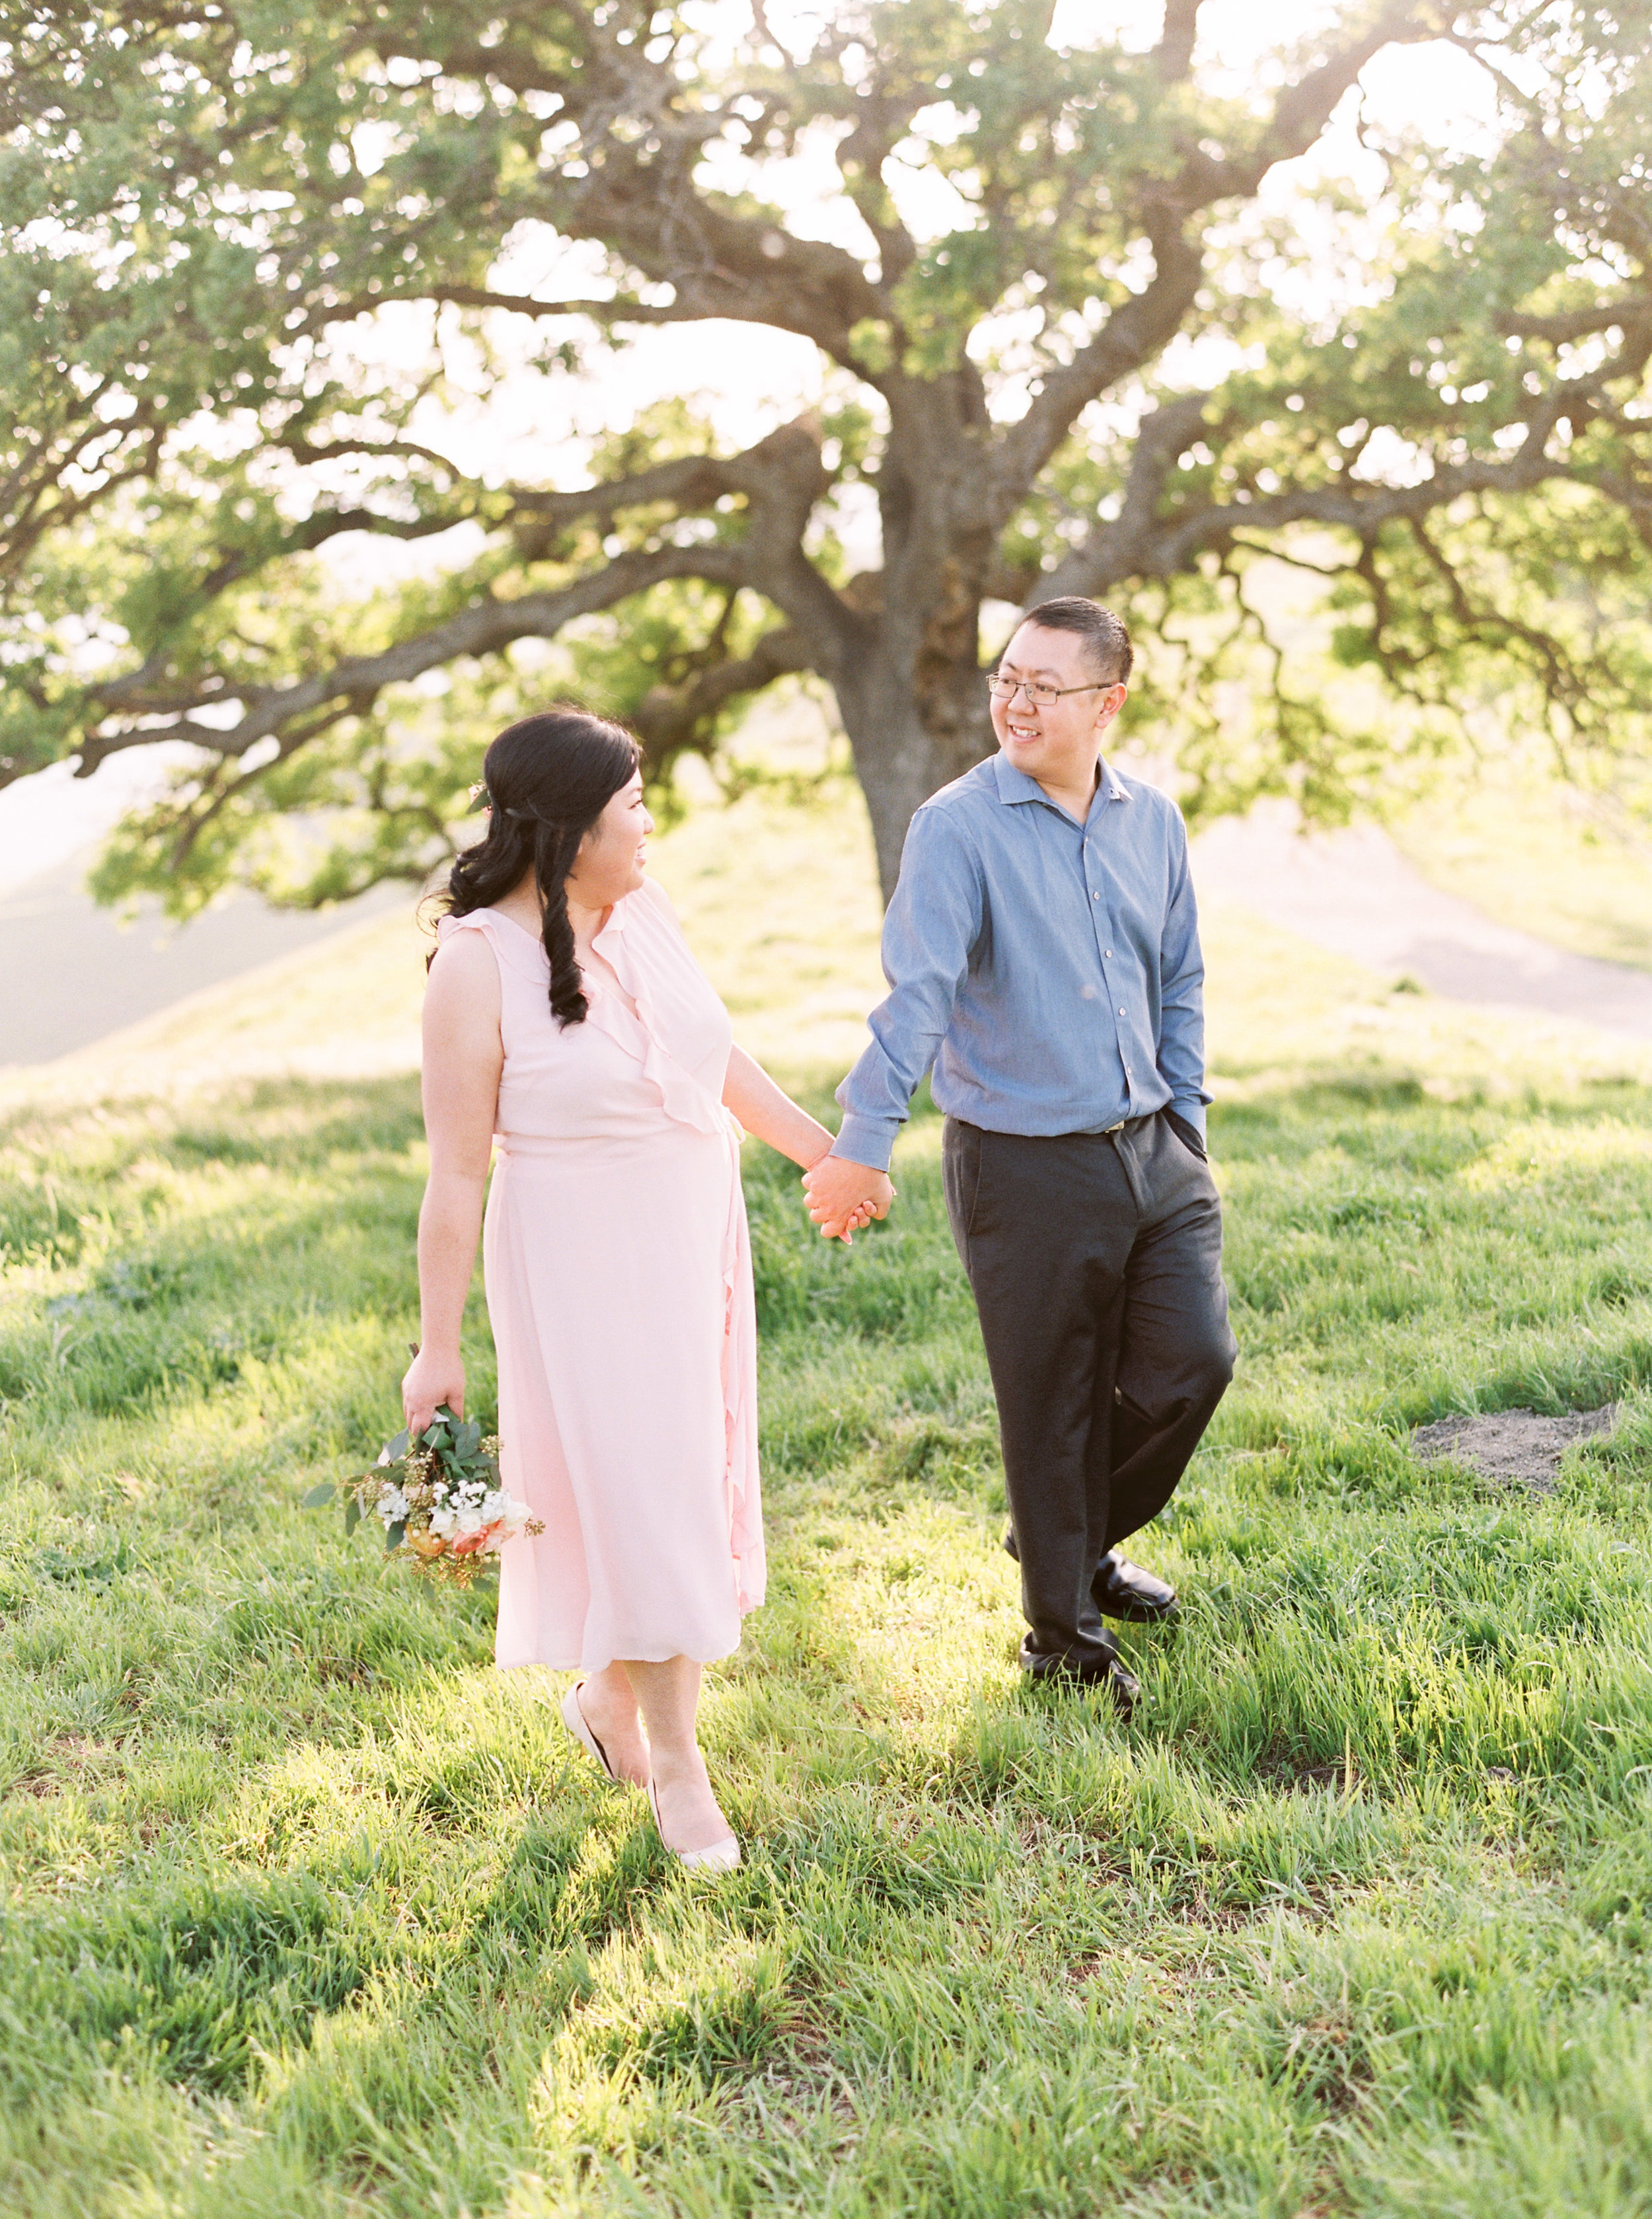 del-valle-livermore-bay-area-wedding-photographer-61.jpg